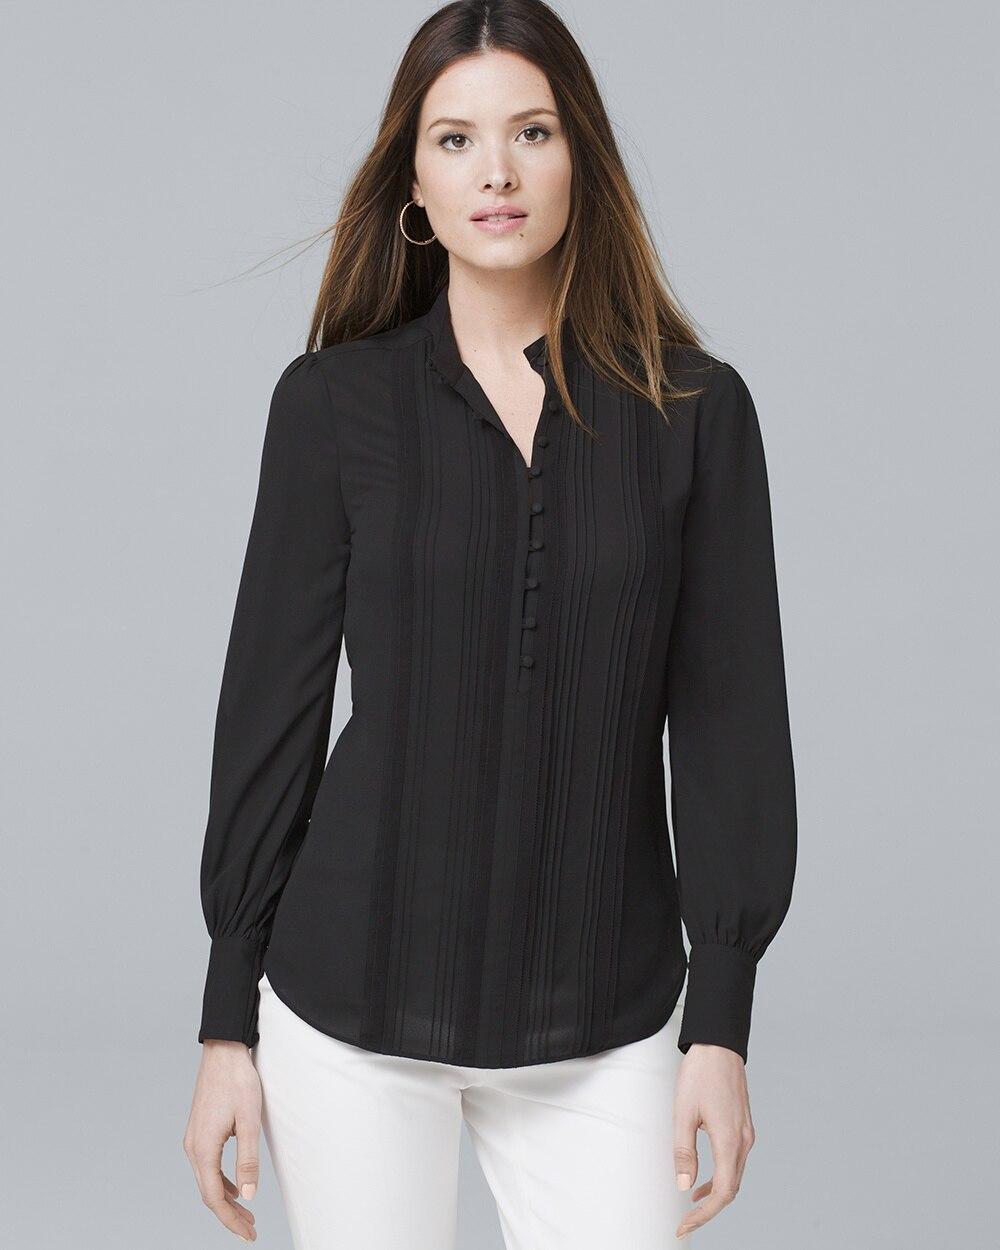 93e09b977f8558 Pintucked Black Button-Front Blouse - White House Black Market